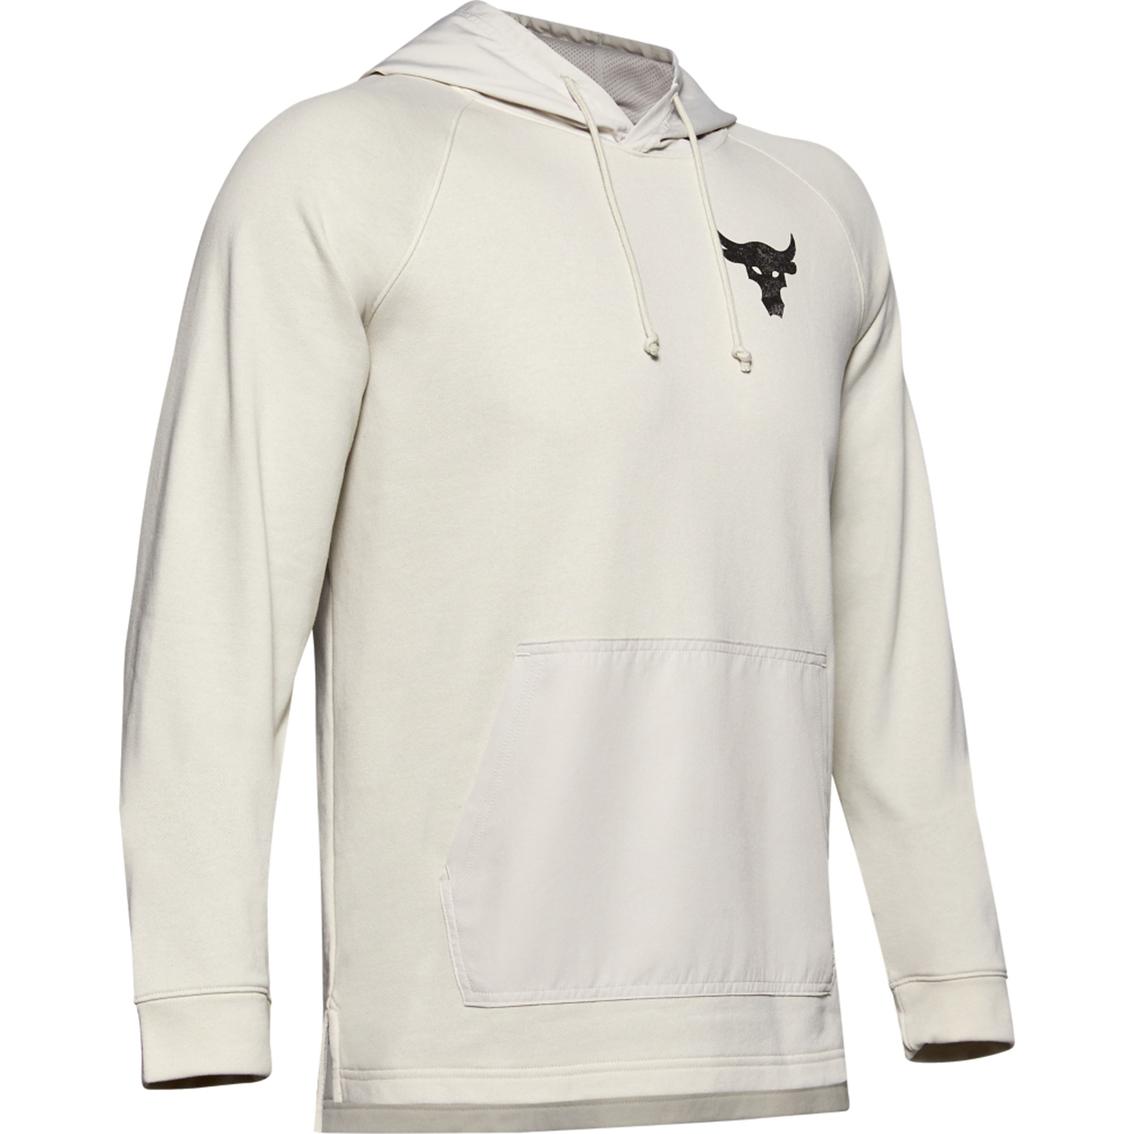 Poland Flag Dog Paw Hoodie Coat Sweater Sweatshirt Unisex Teen Baseball Uniform Jacket